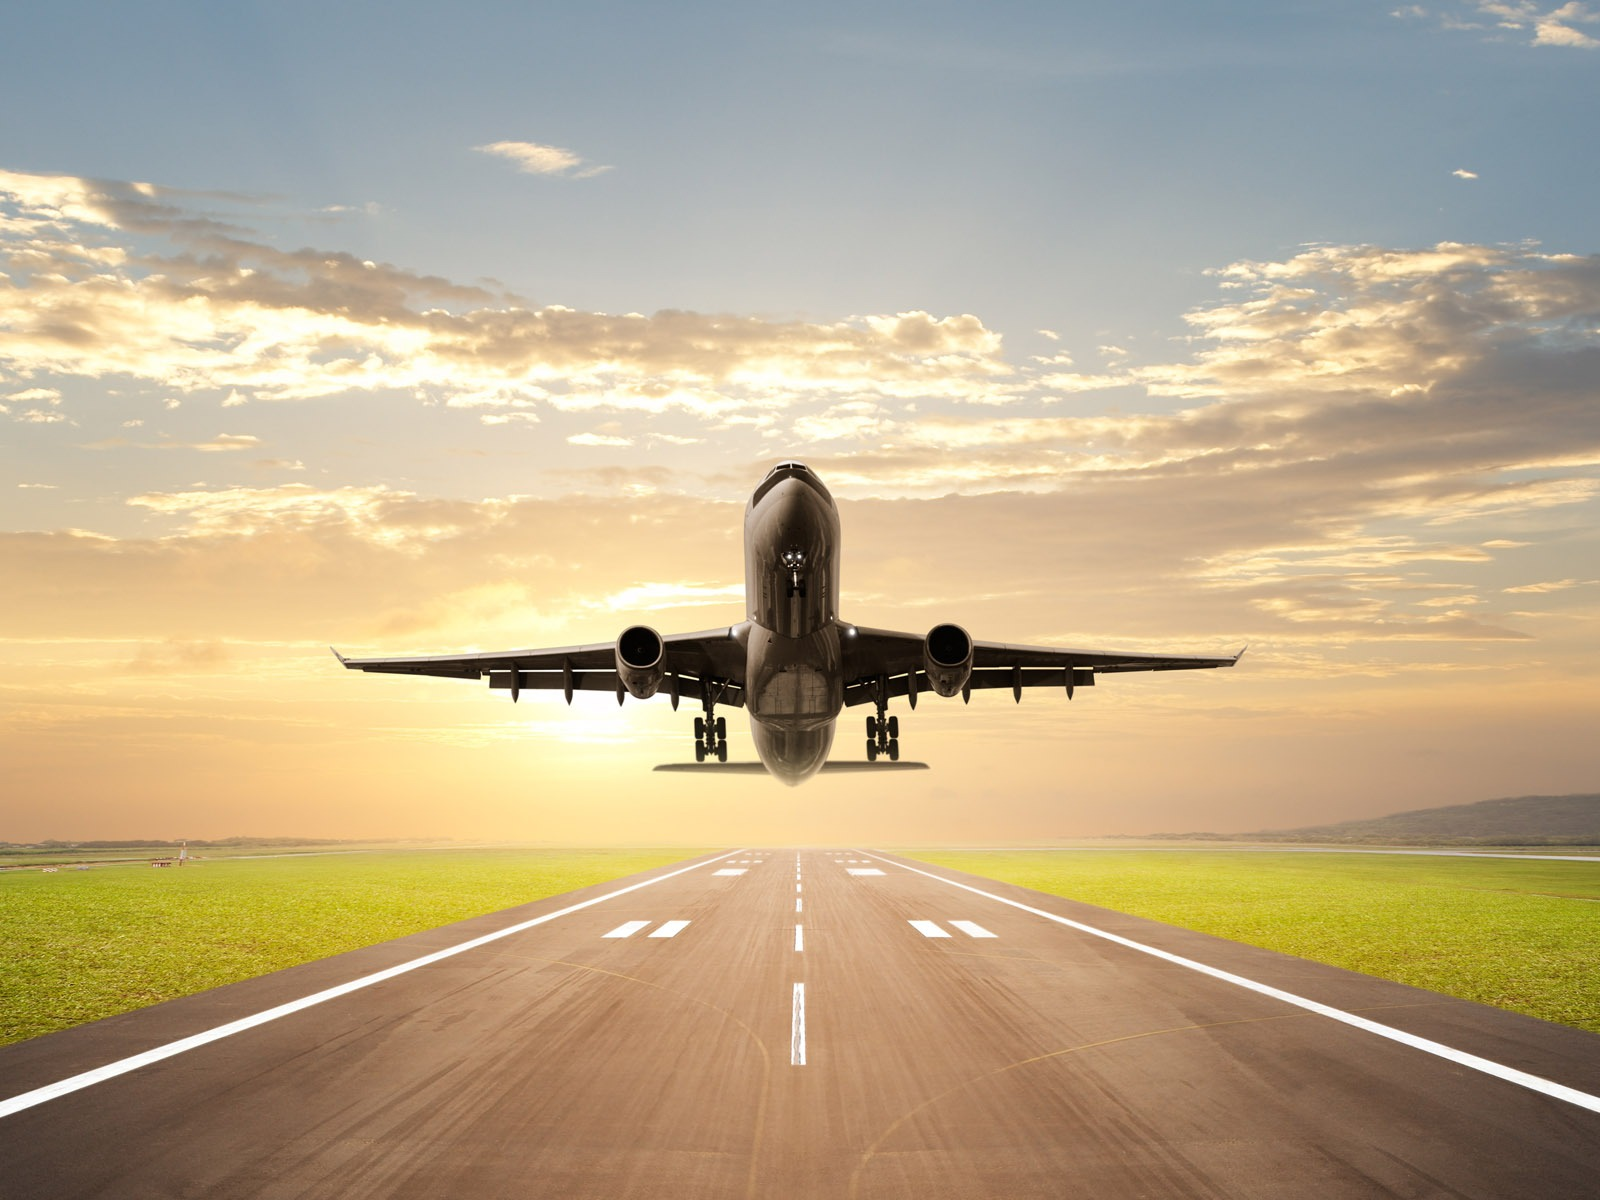 Free Aviation Wallpaper